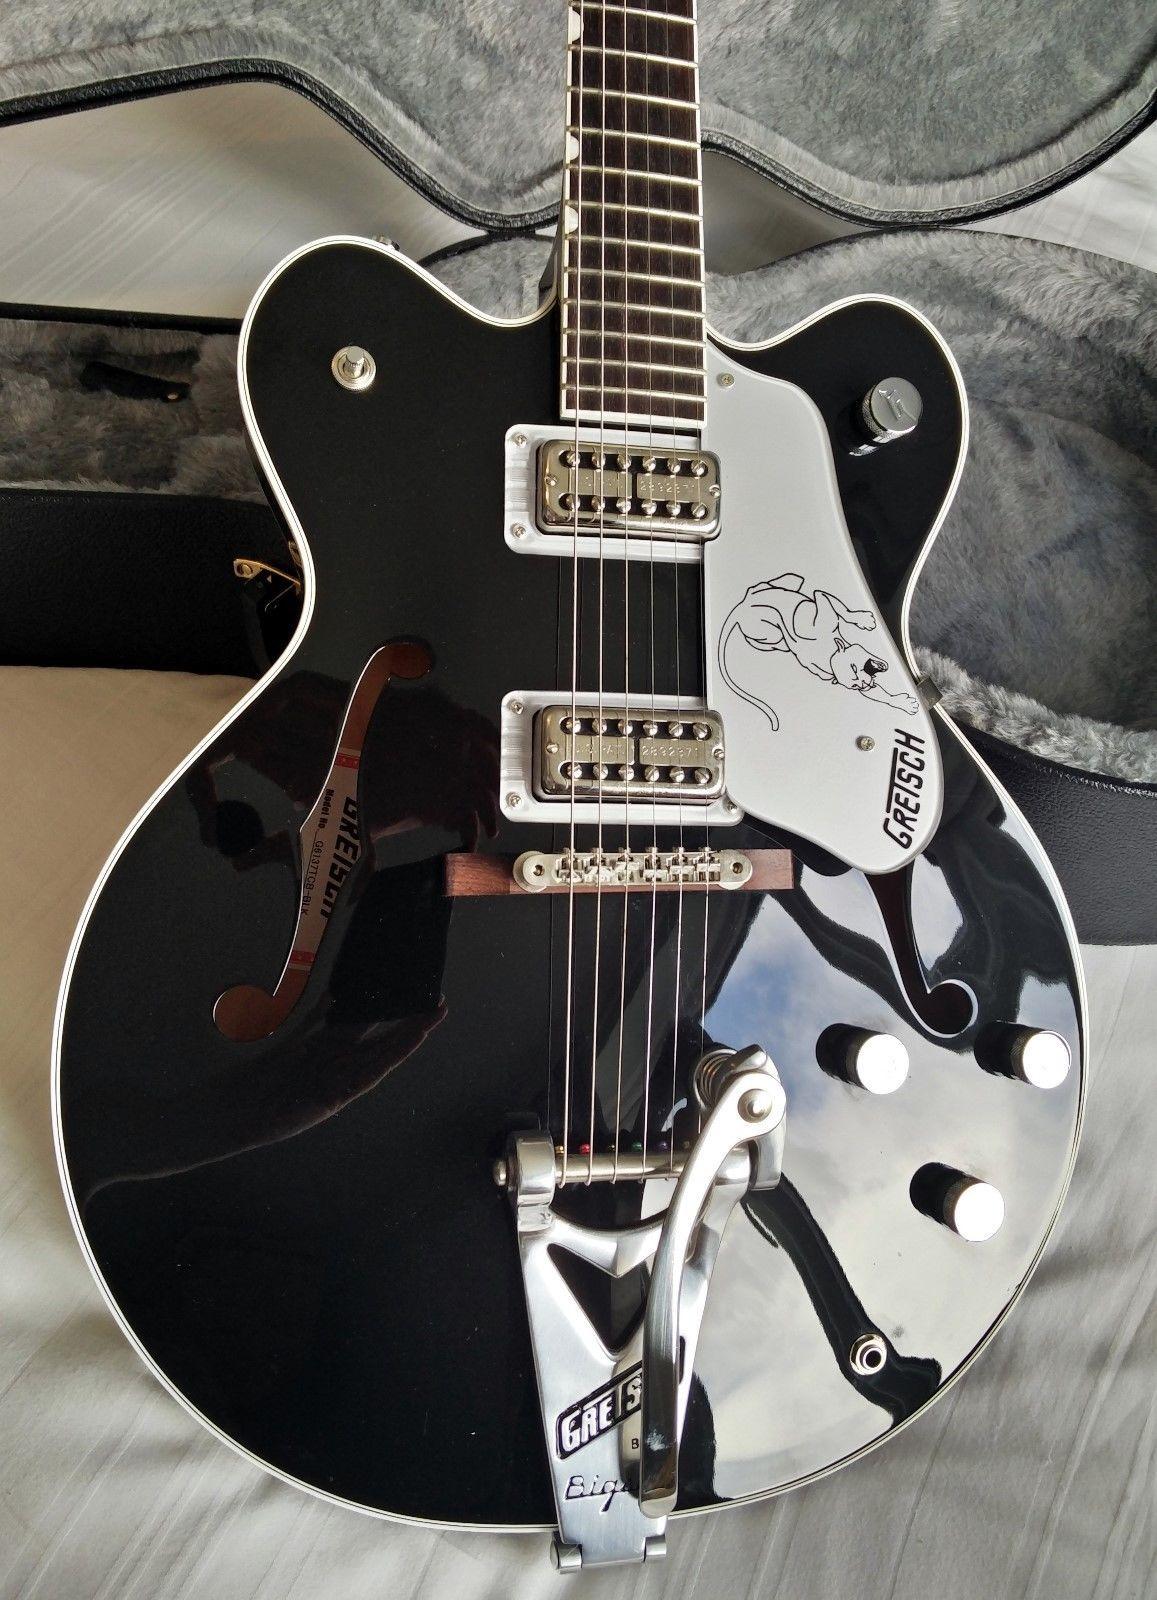 1962 gretsch tennessean guitar wiring diagram [ 1157 x 1600 Pixel ]